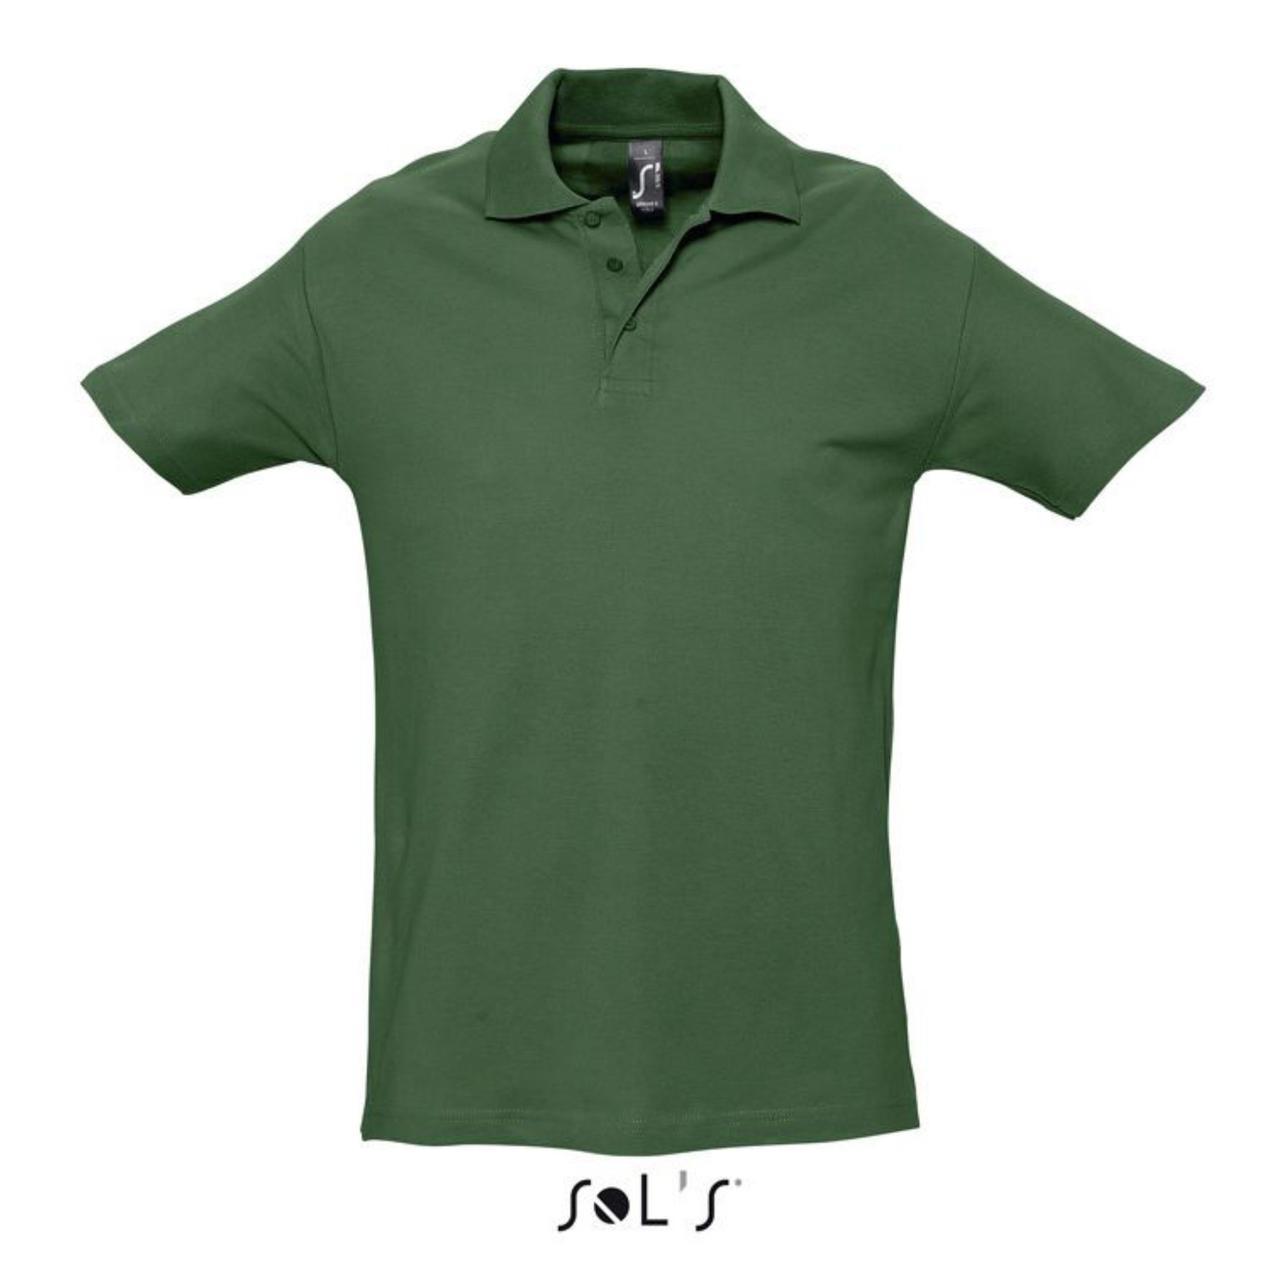 Рубашка поло SPRING II, цвет Golf green, размер M